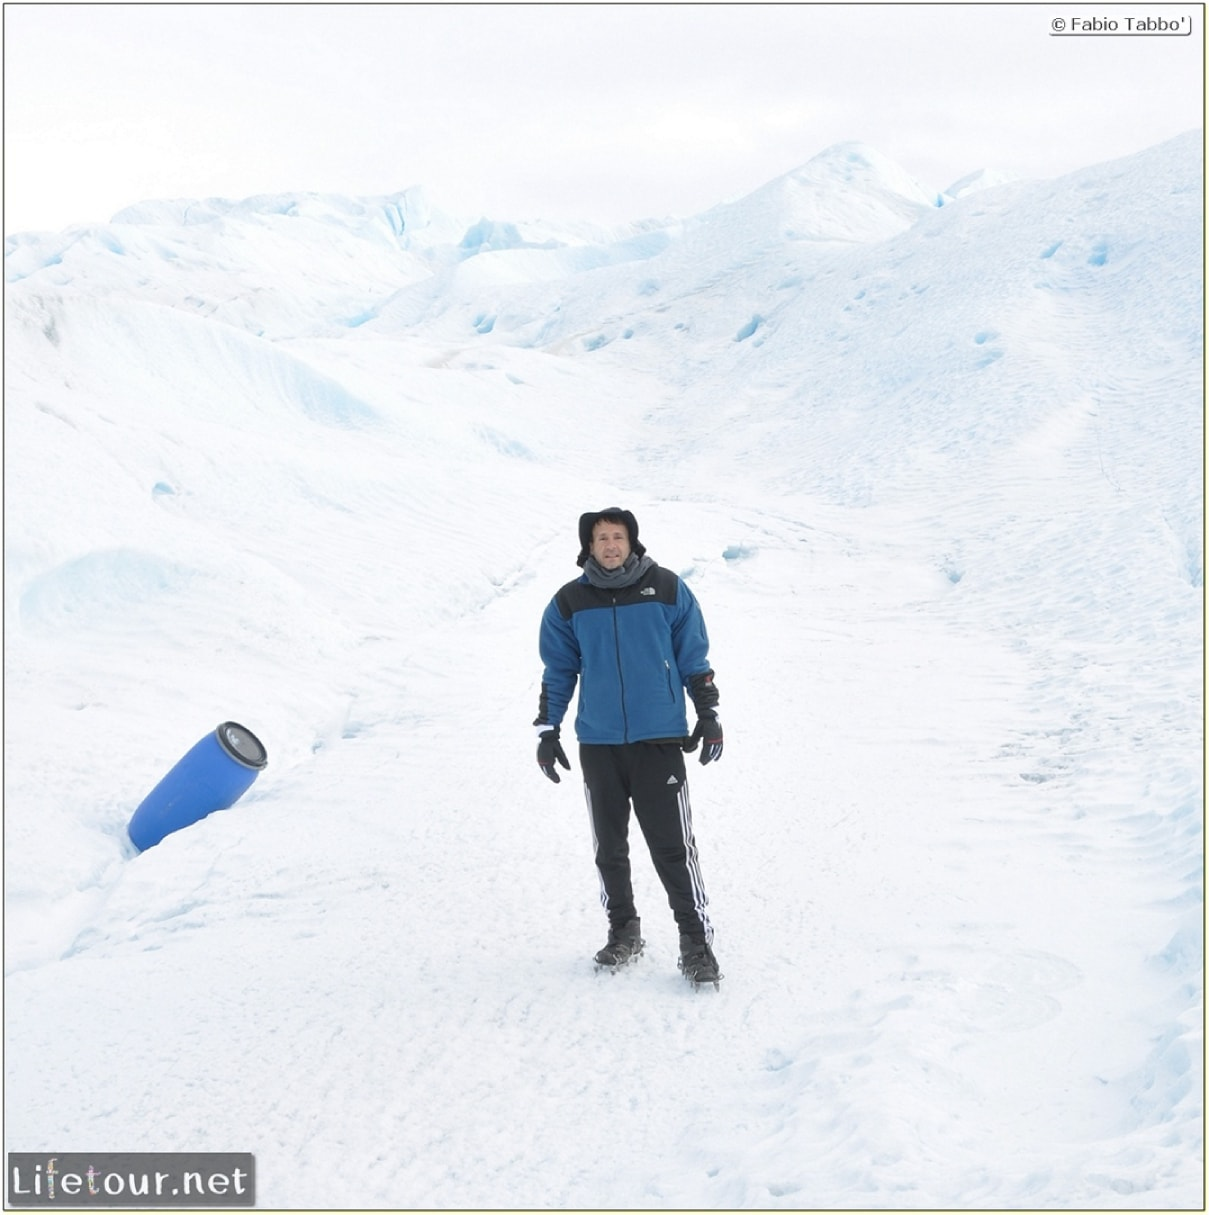 Southern-section-Hielo-y-Aventura-trekking-4-Climbing-the-Perito-Moreno-glacier-36-1